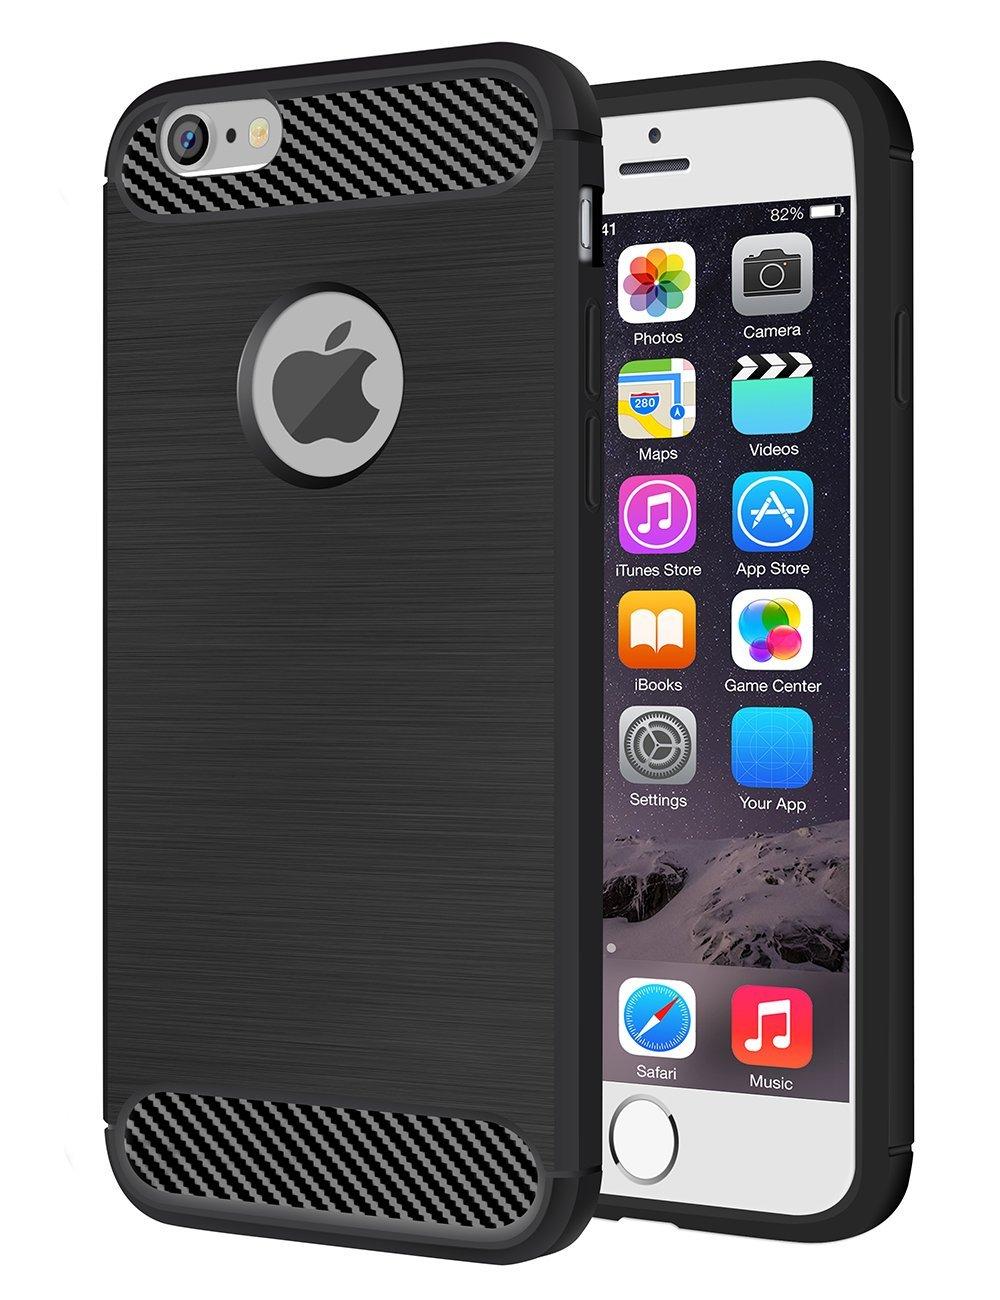 iPhone 6/6S Case, Zoudashuai Soft TPU Ultra Slim Thin Clear Durable Anti-Slip and Anti-Scratch Case Rugged Shock-absorption Bumper Cover for iPhone 6/6S 4.7 Inch(Black)